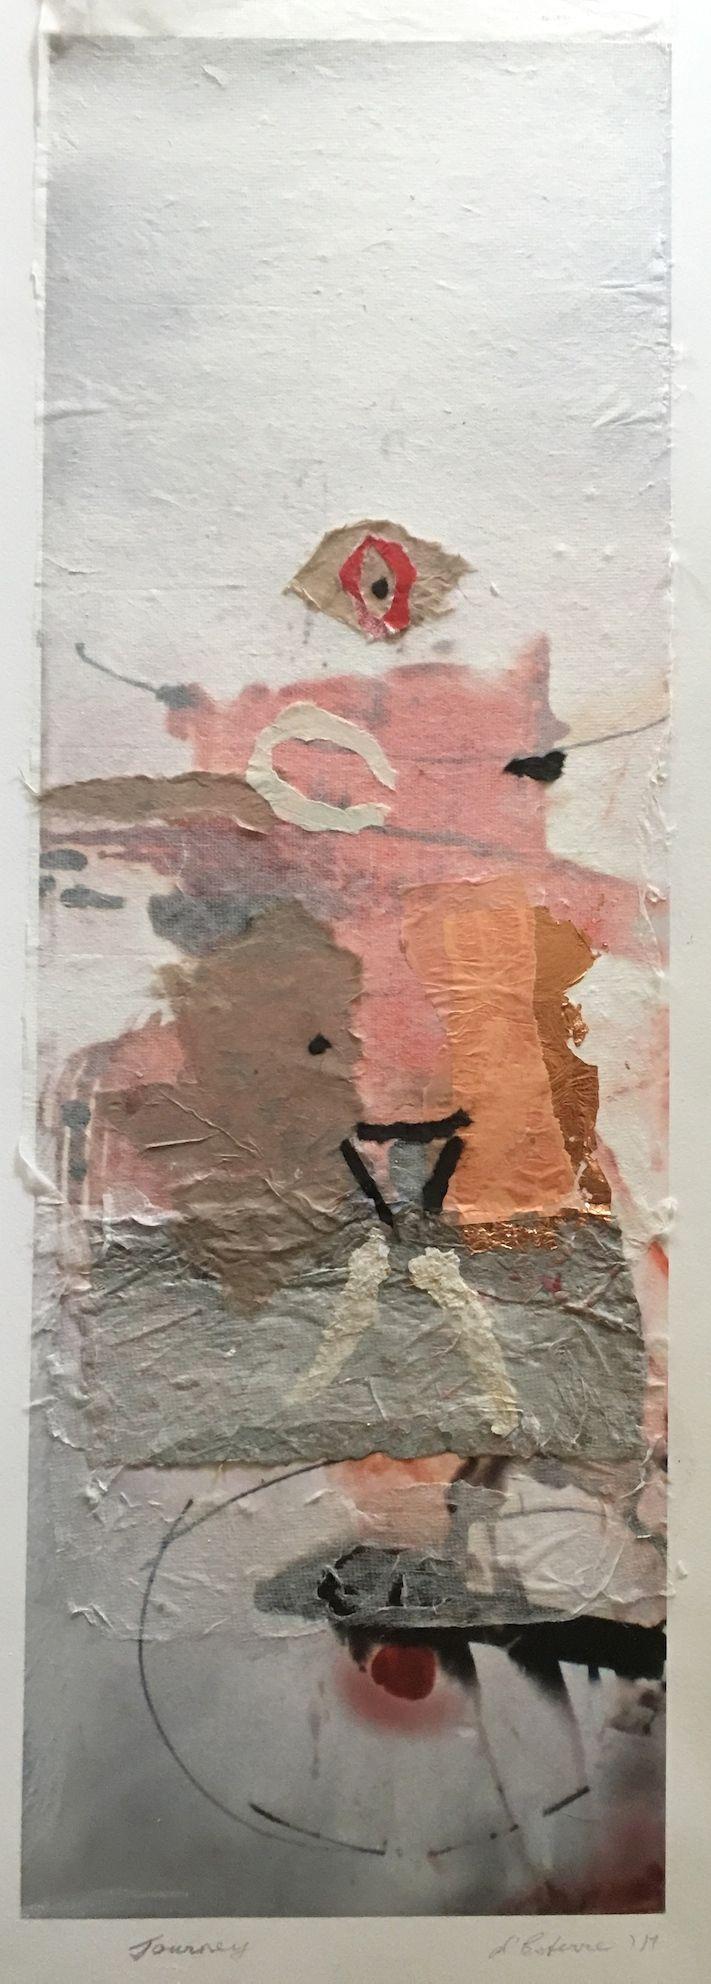 Elaine d'Esterre - Journey, 2017, digital print, collage and handmade paper, 75x25 cm. Also ART BLOG at http://elainedesterreart.com/ and http://www.facebook.com/elainedesterreart/ and http://instagram.com/desterreart/